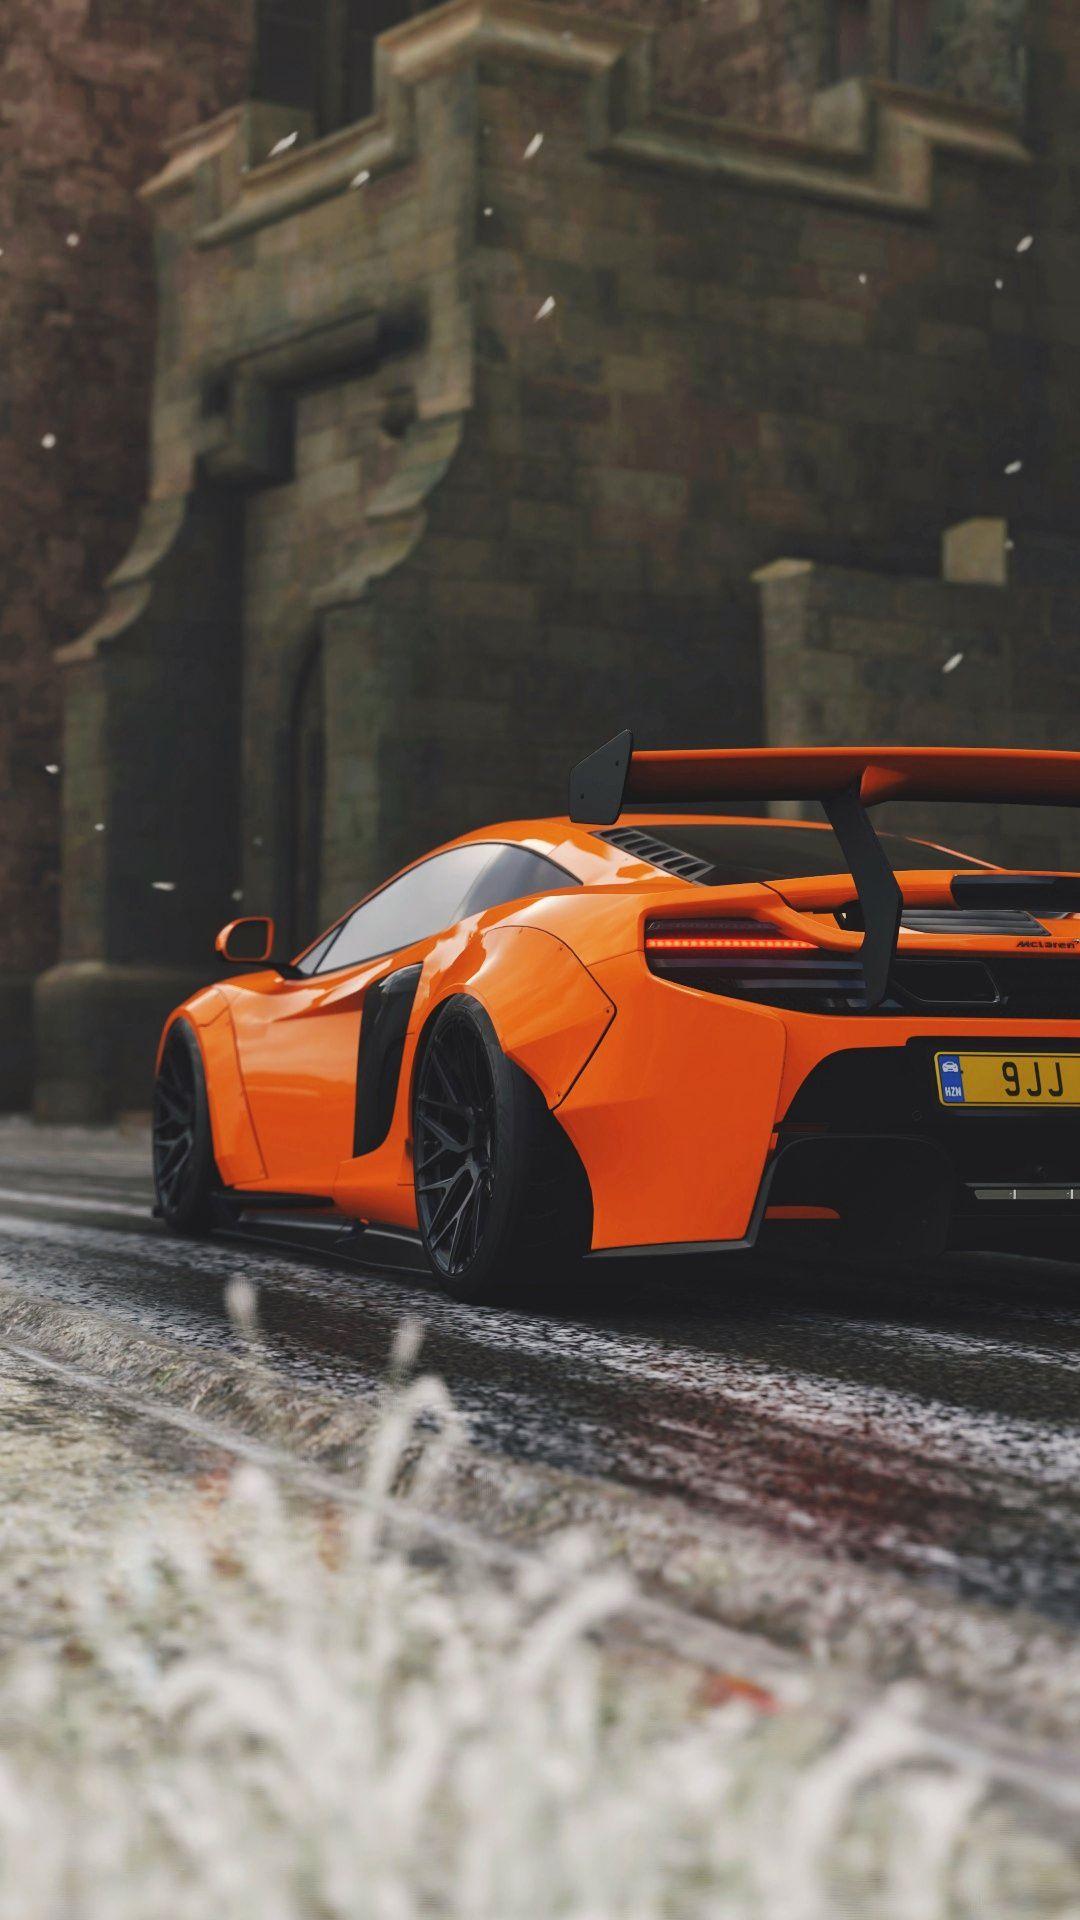 Wallpapers Mclaren 12c Automotive Exterior Orange Supercar Sportscar Sports Car Best Luxury Cars Mclaren Cars